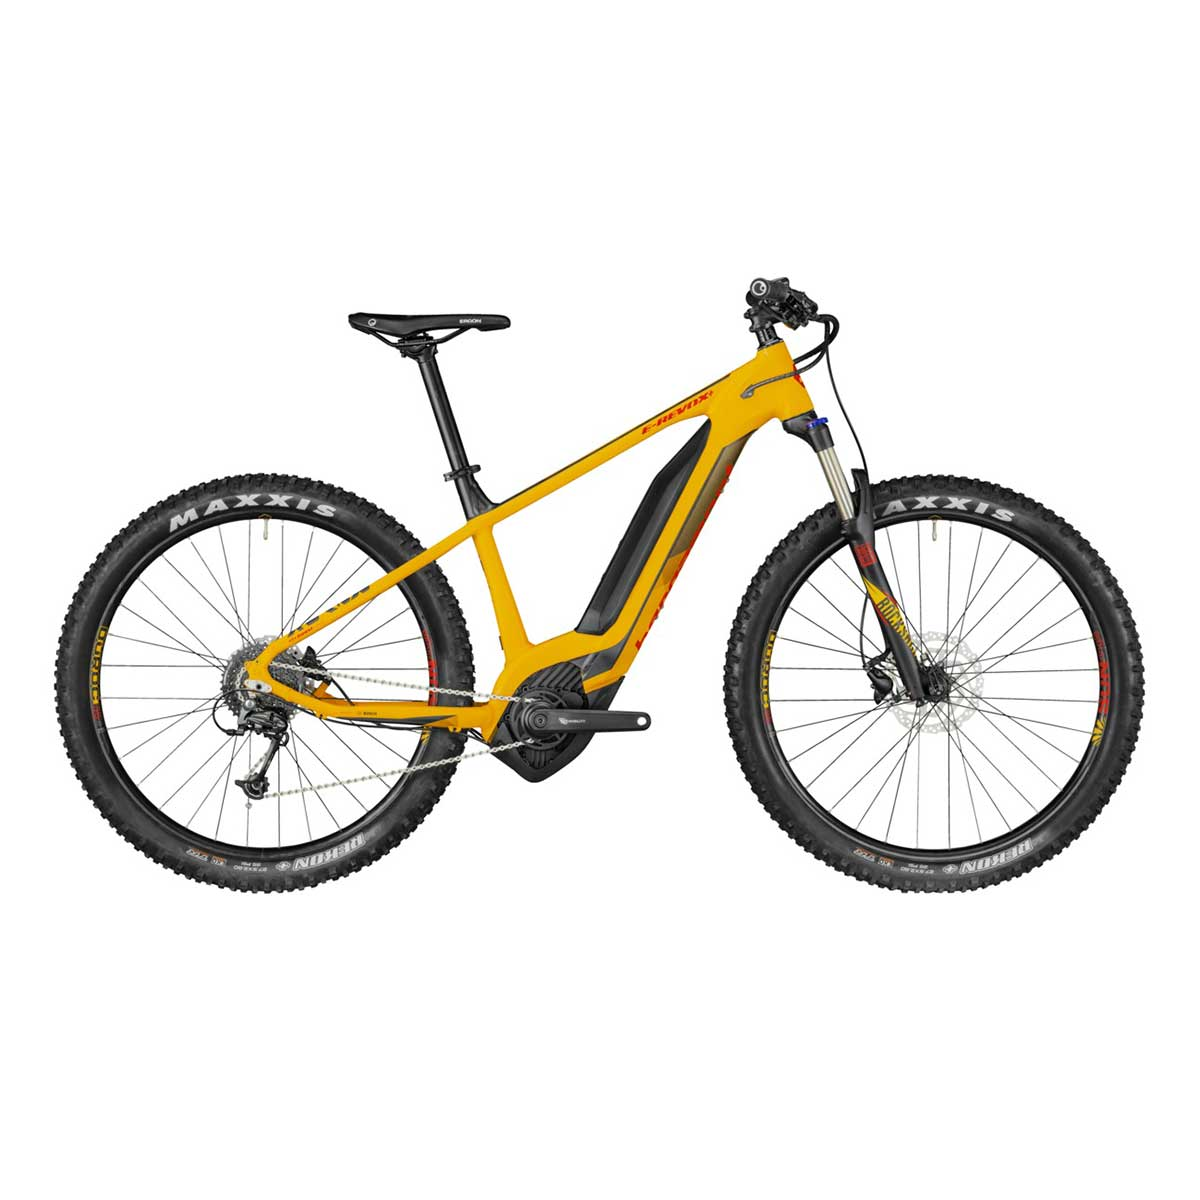 mountainbikes follow me bike snowsports. Black Bedroom Furniture Sets. Home Design Ideas